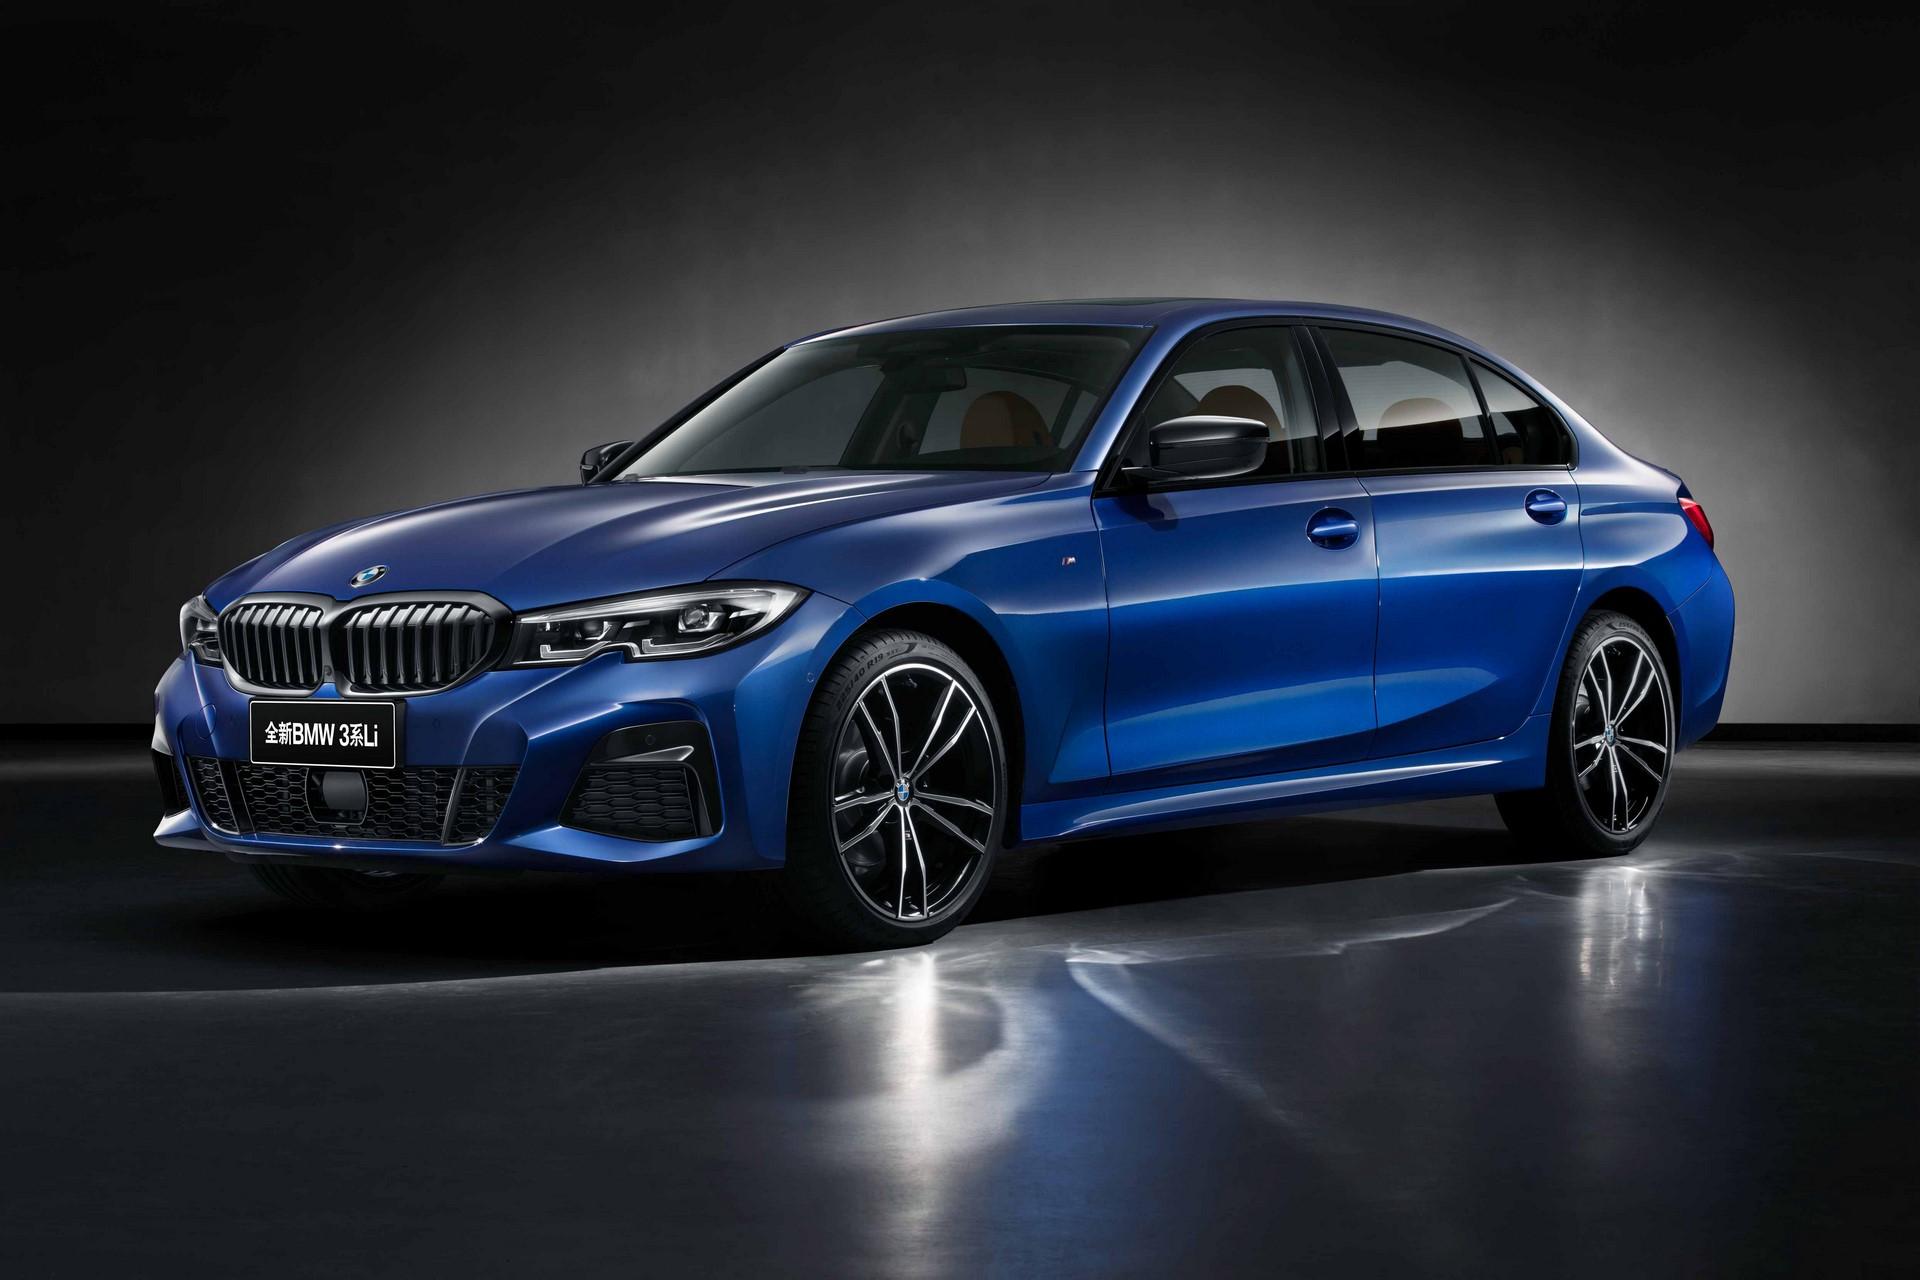 BMW-3-Series-LWB-Long-Wheelbase-2019-10